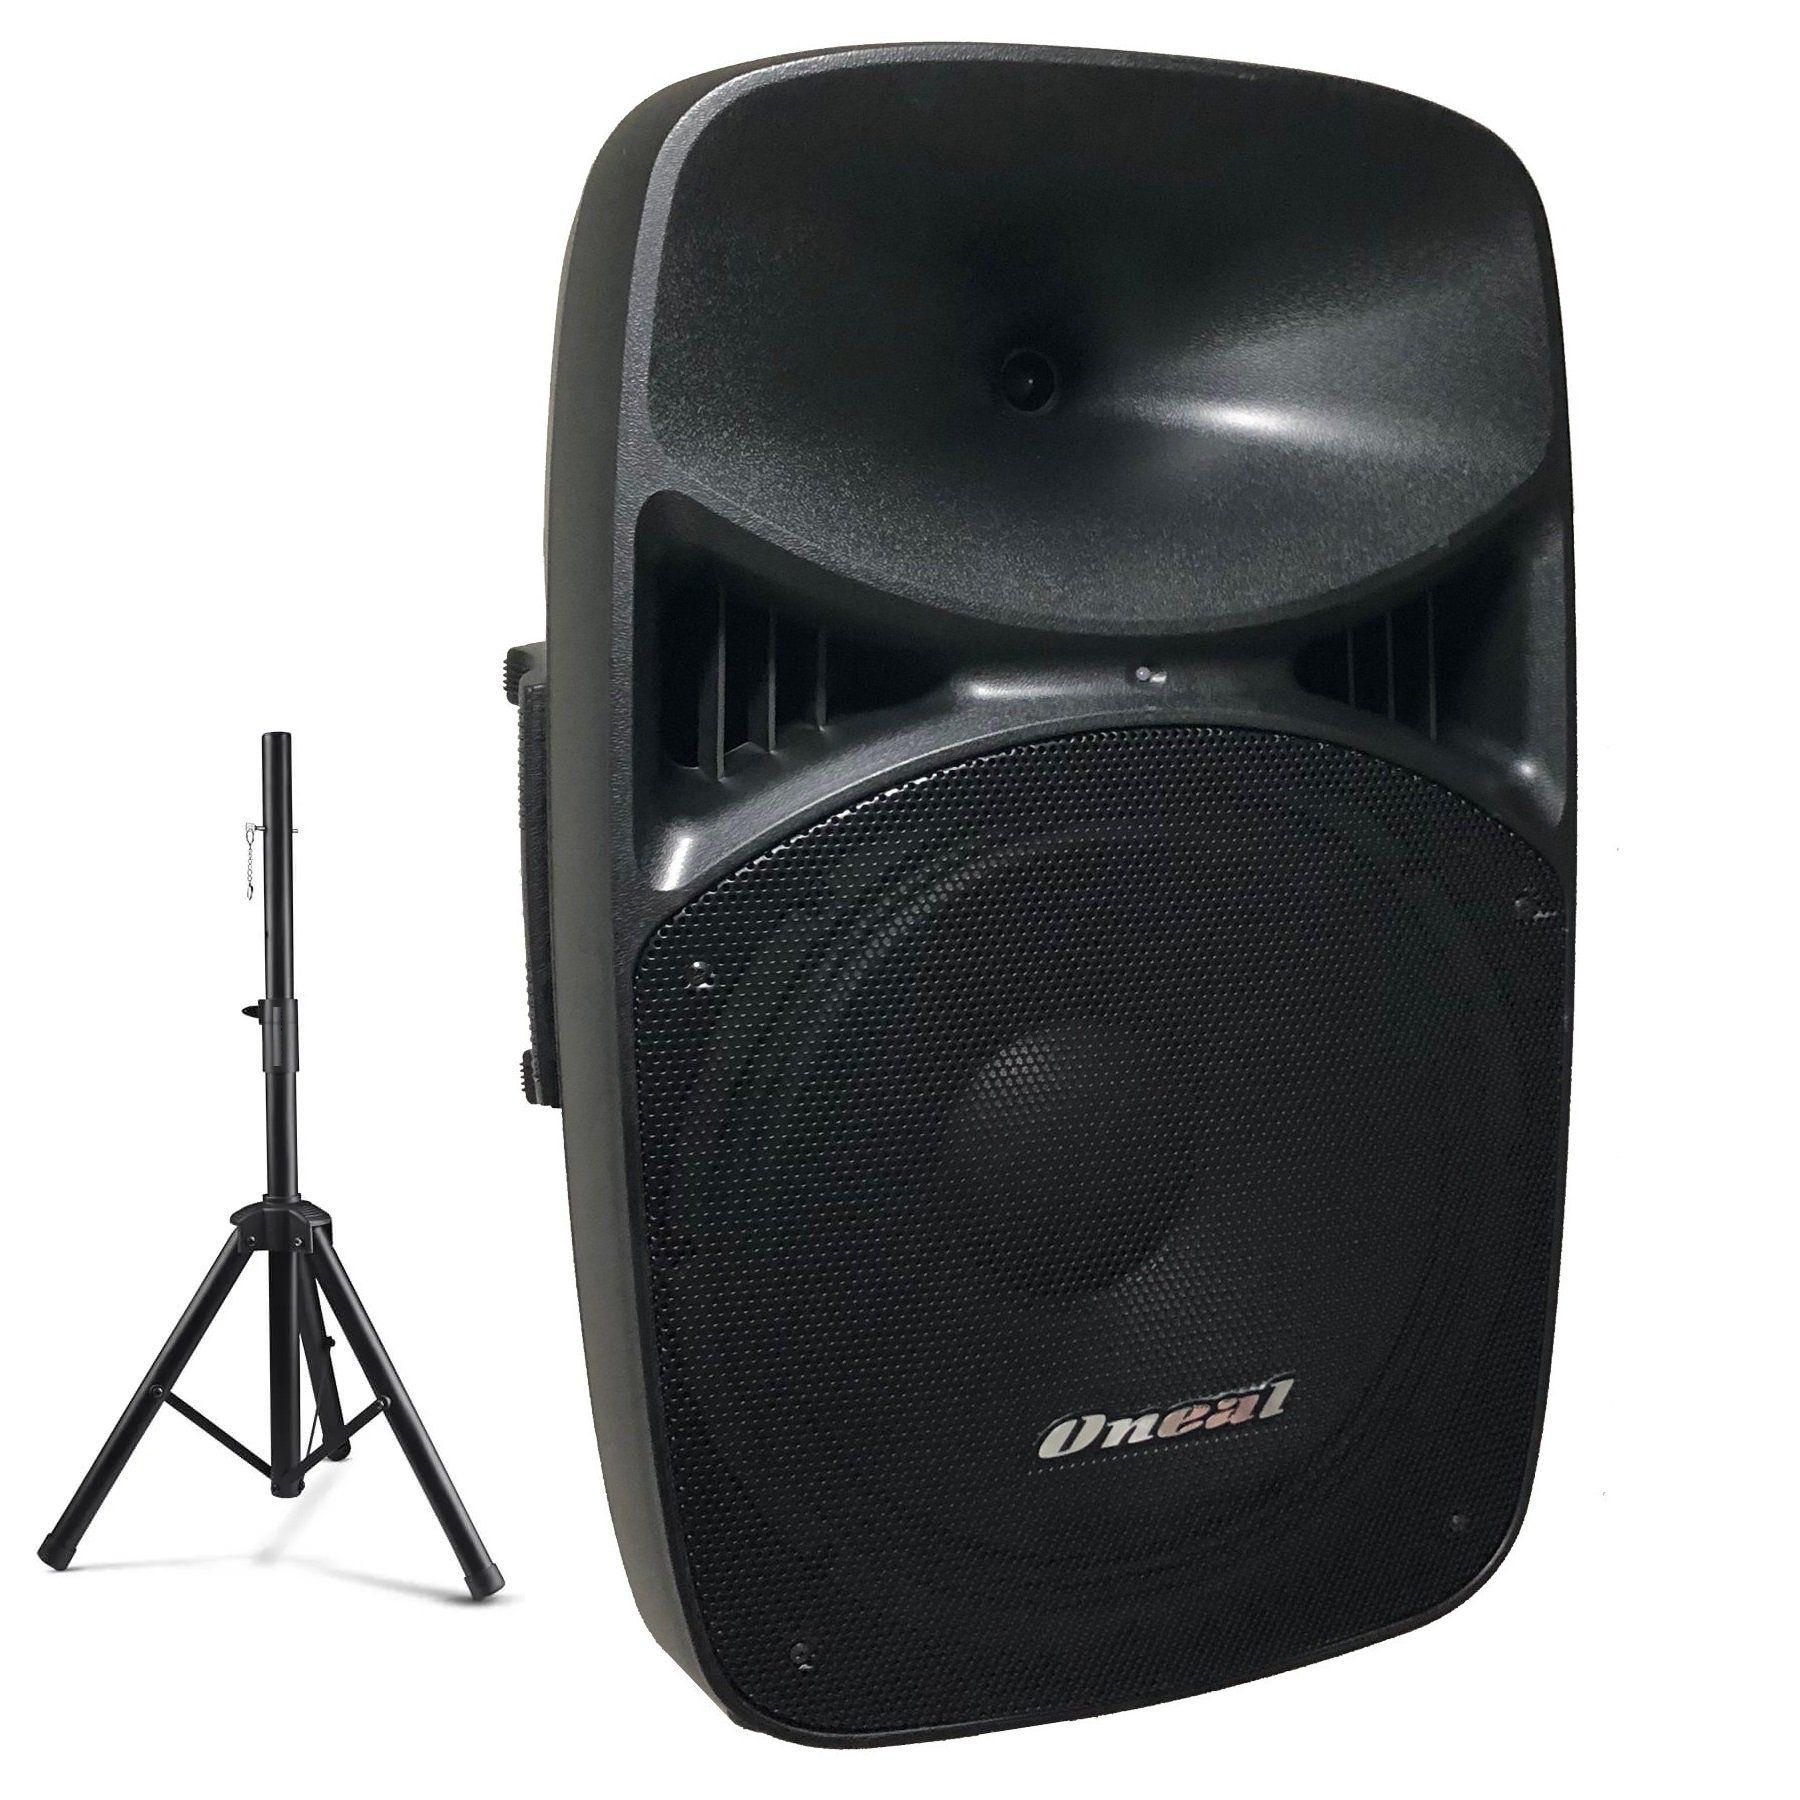 Kit 2 Caixa de Som Ativa Oneal Bluetooth Opb915bt 720w